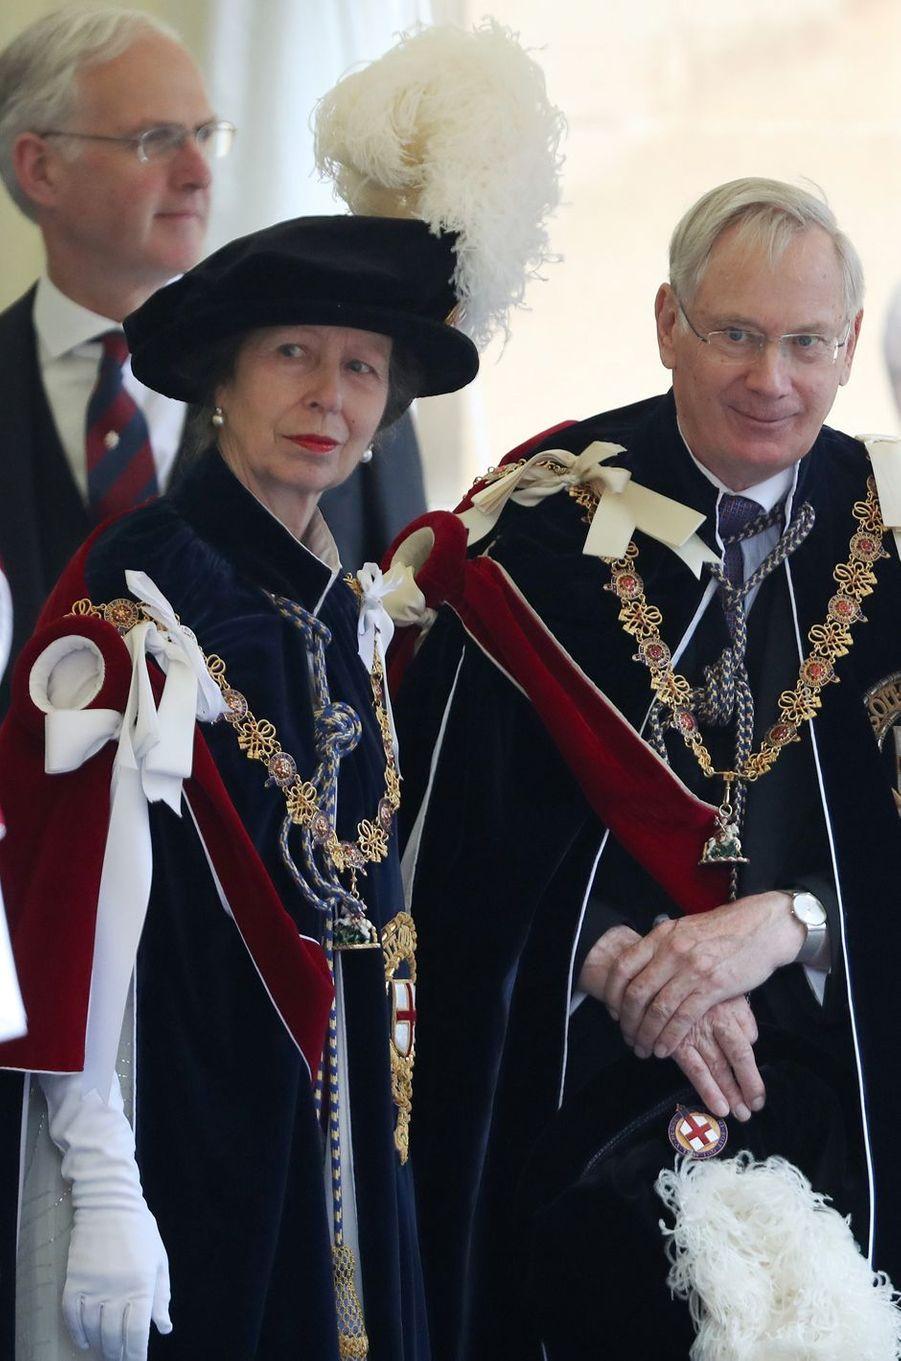 La princesse Anne à Windsor, le 13 juin 2016